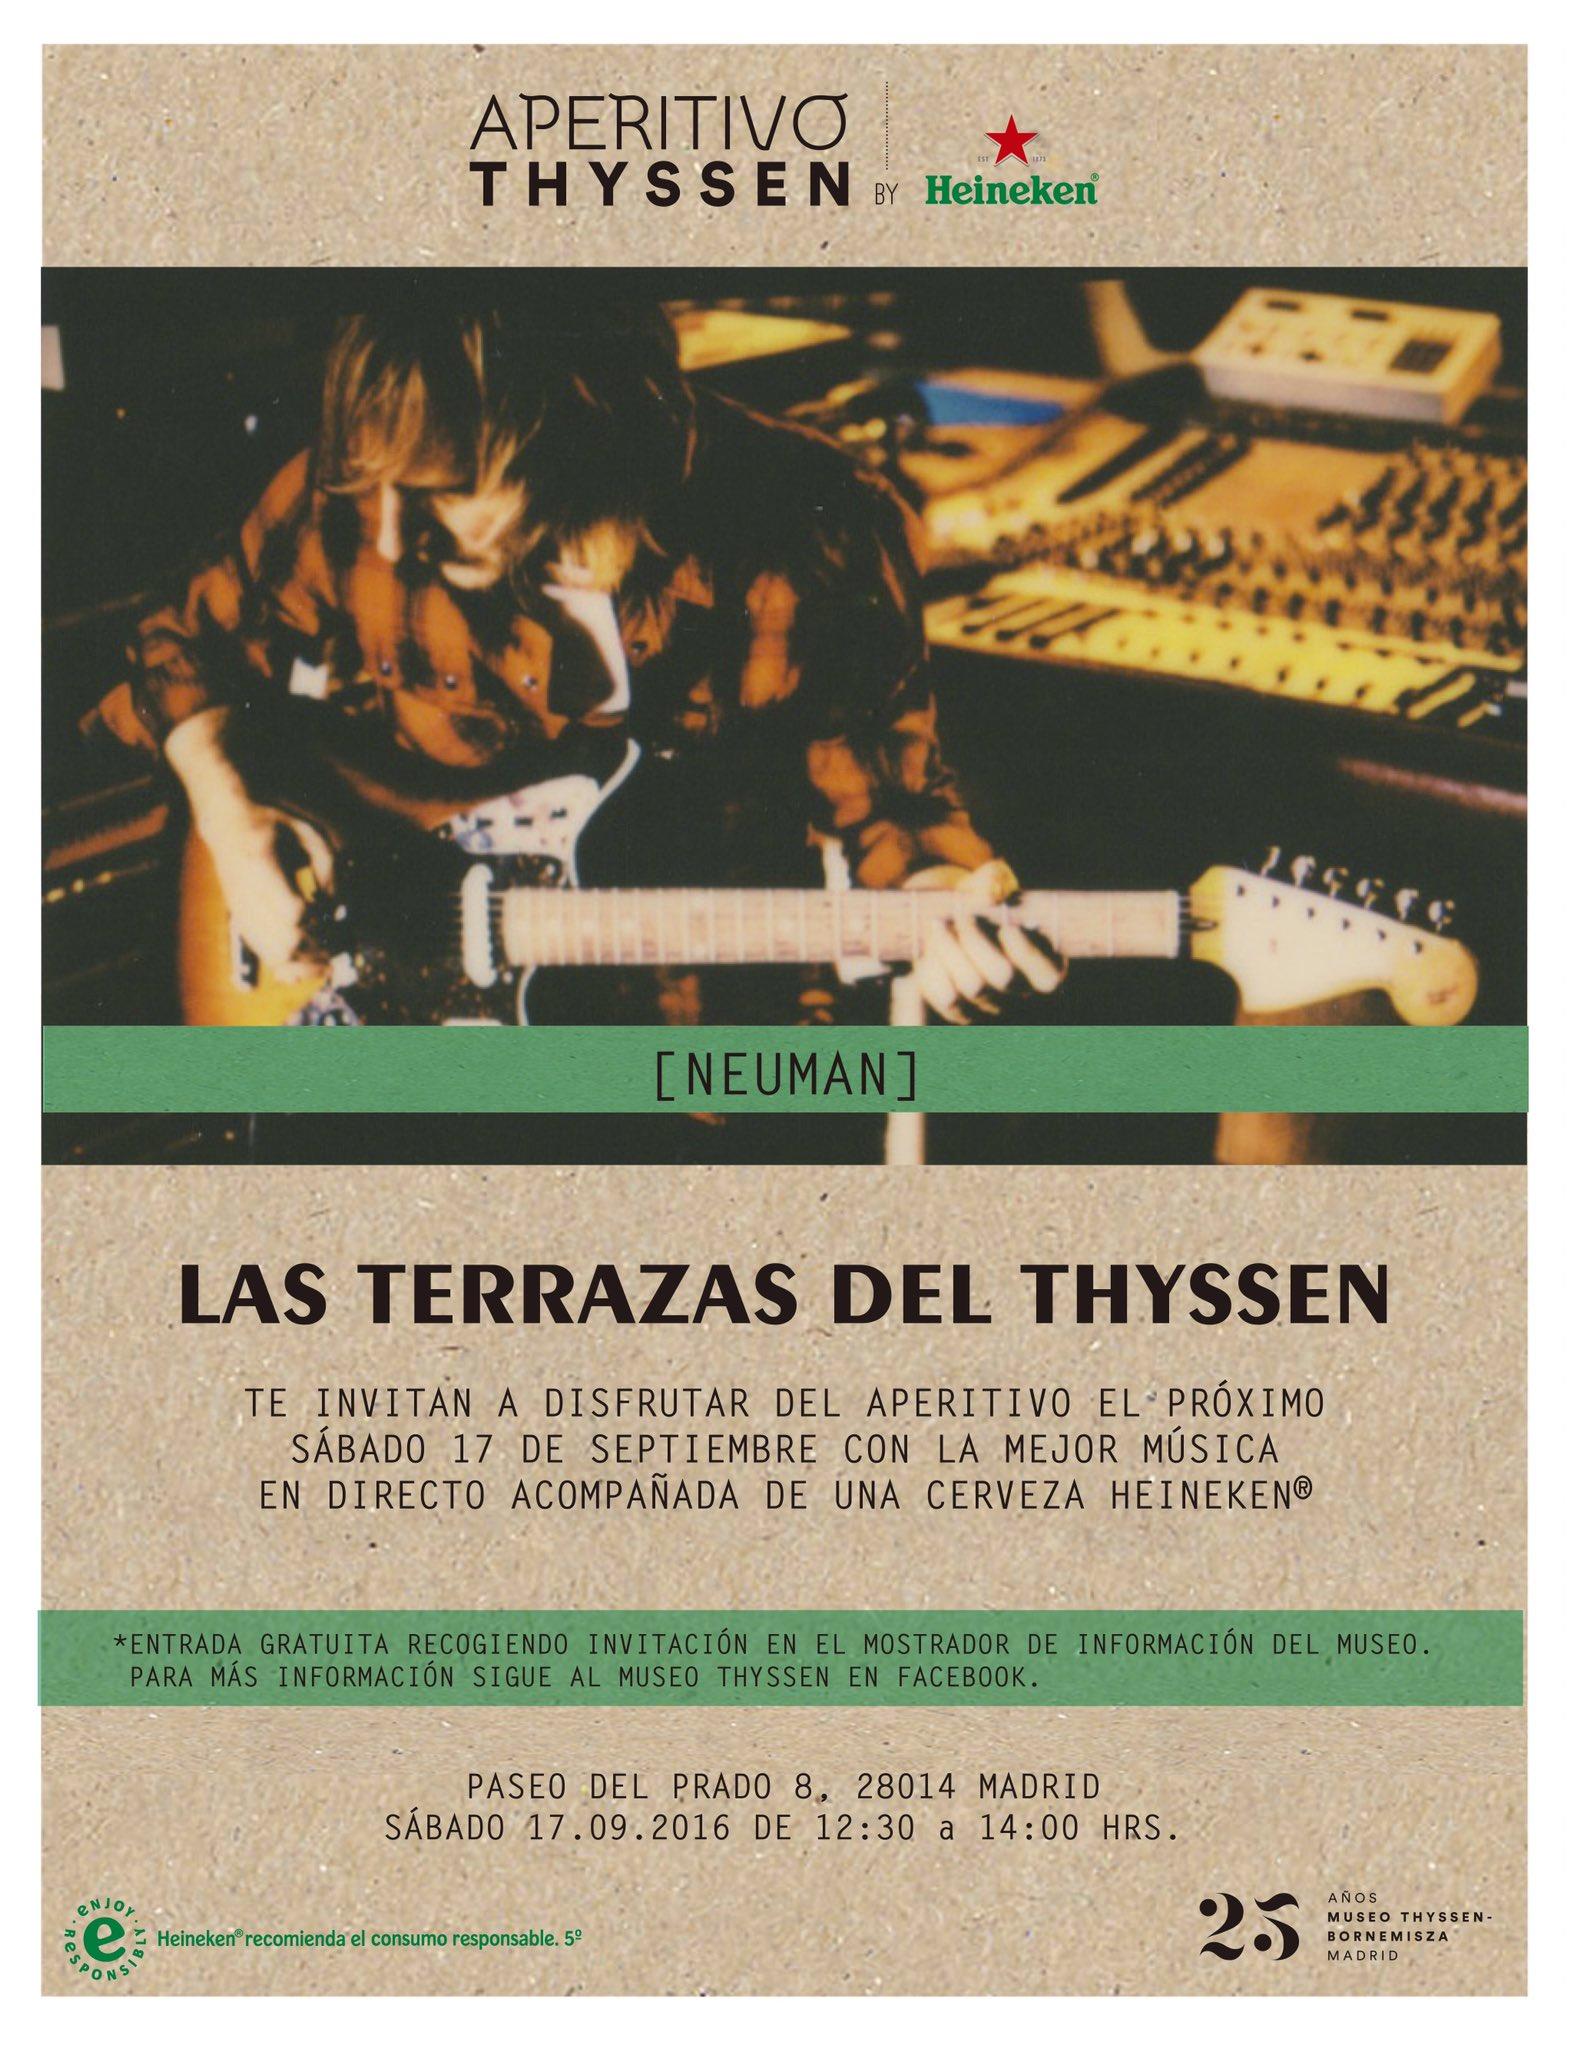 Concierto de Neuman en Aperitivos Thyssen